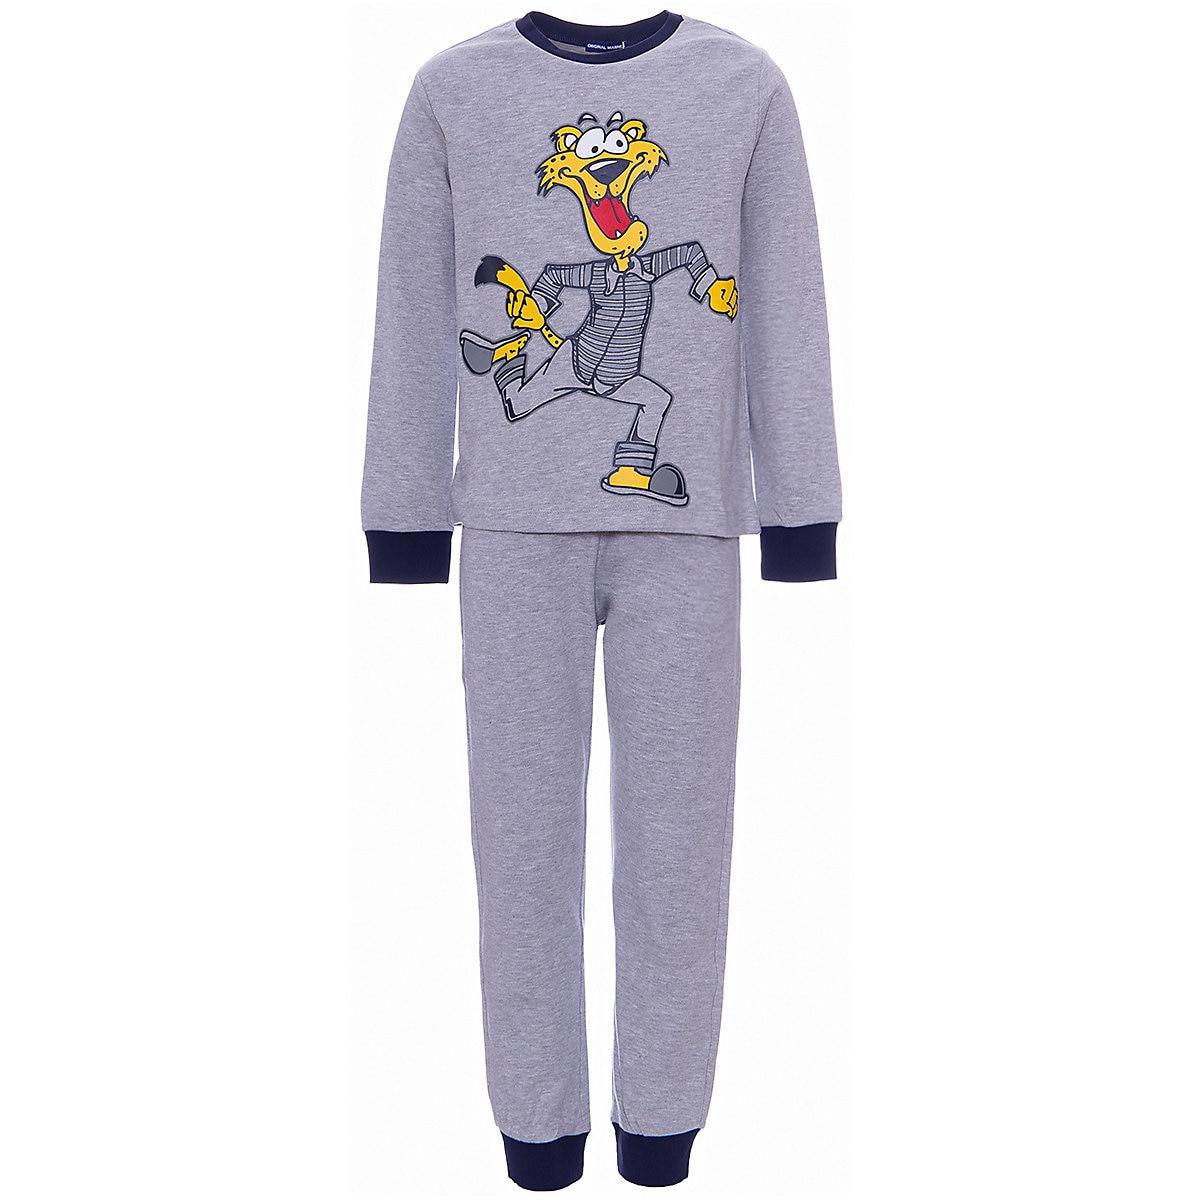 ORIGINAL MARINES Pajama Sets 9501035 Cotton Boys childrens clothing Sleepwear Robe parrot print cami pajama set with robe